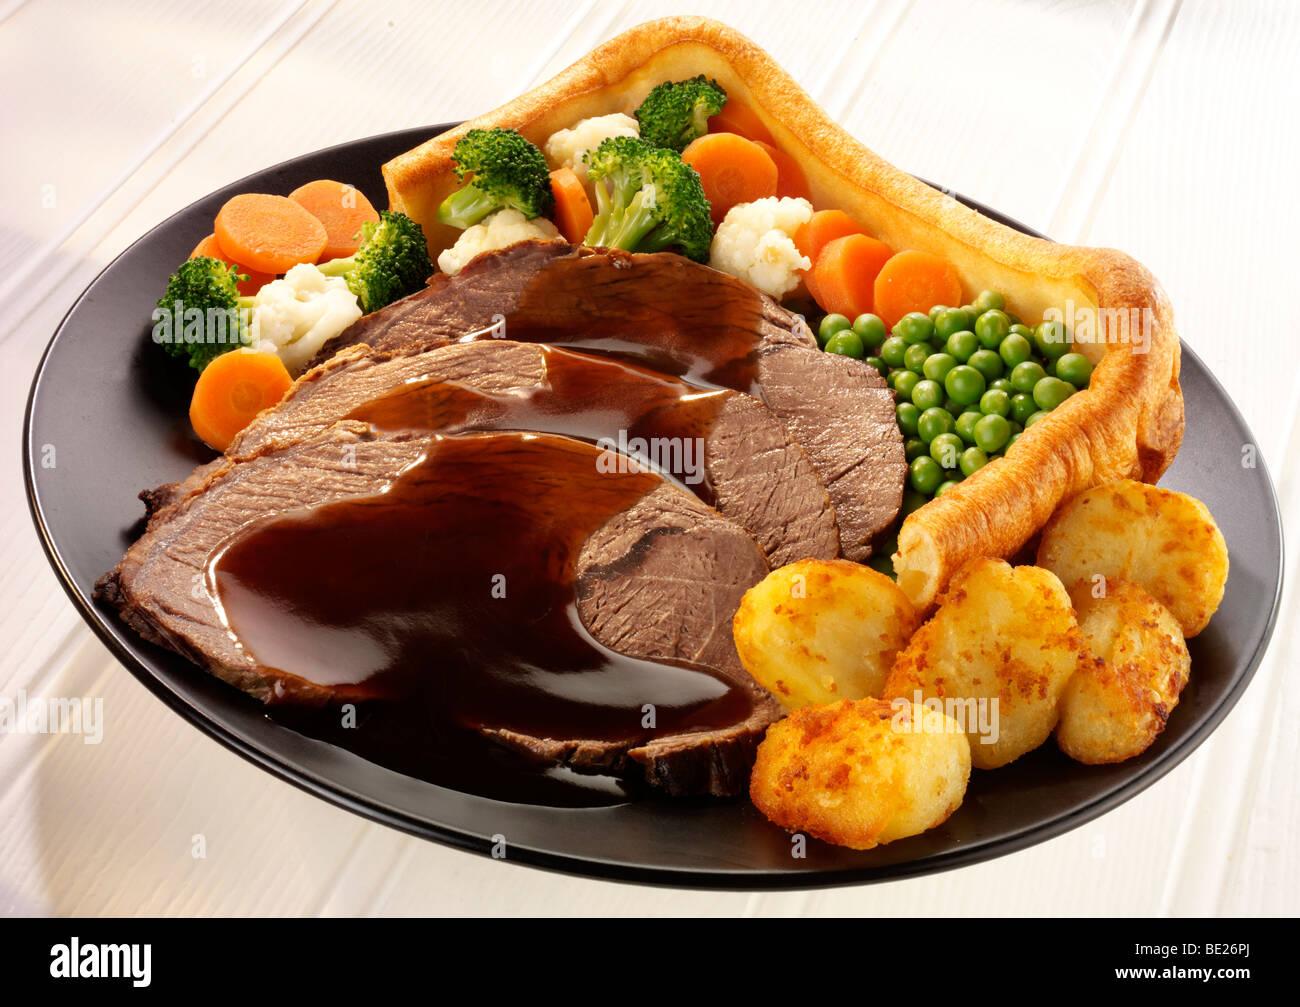 Nice presentation, good portions, did not like the roast beef.